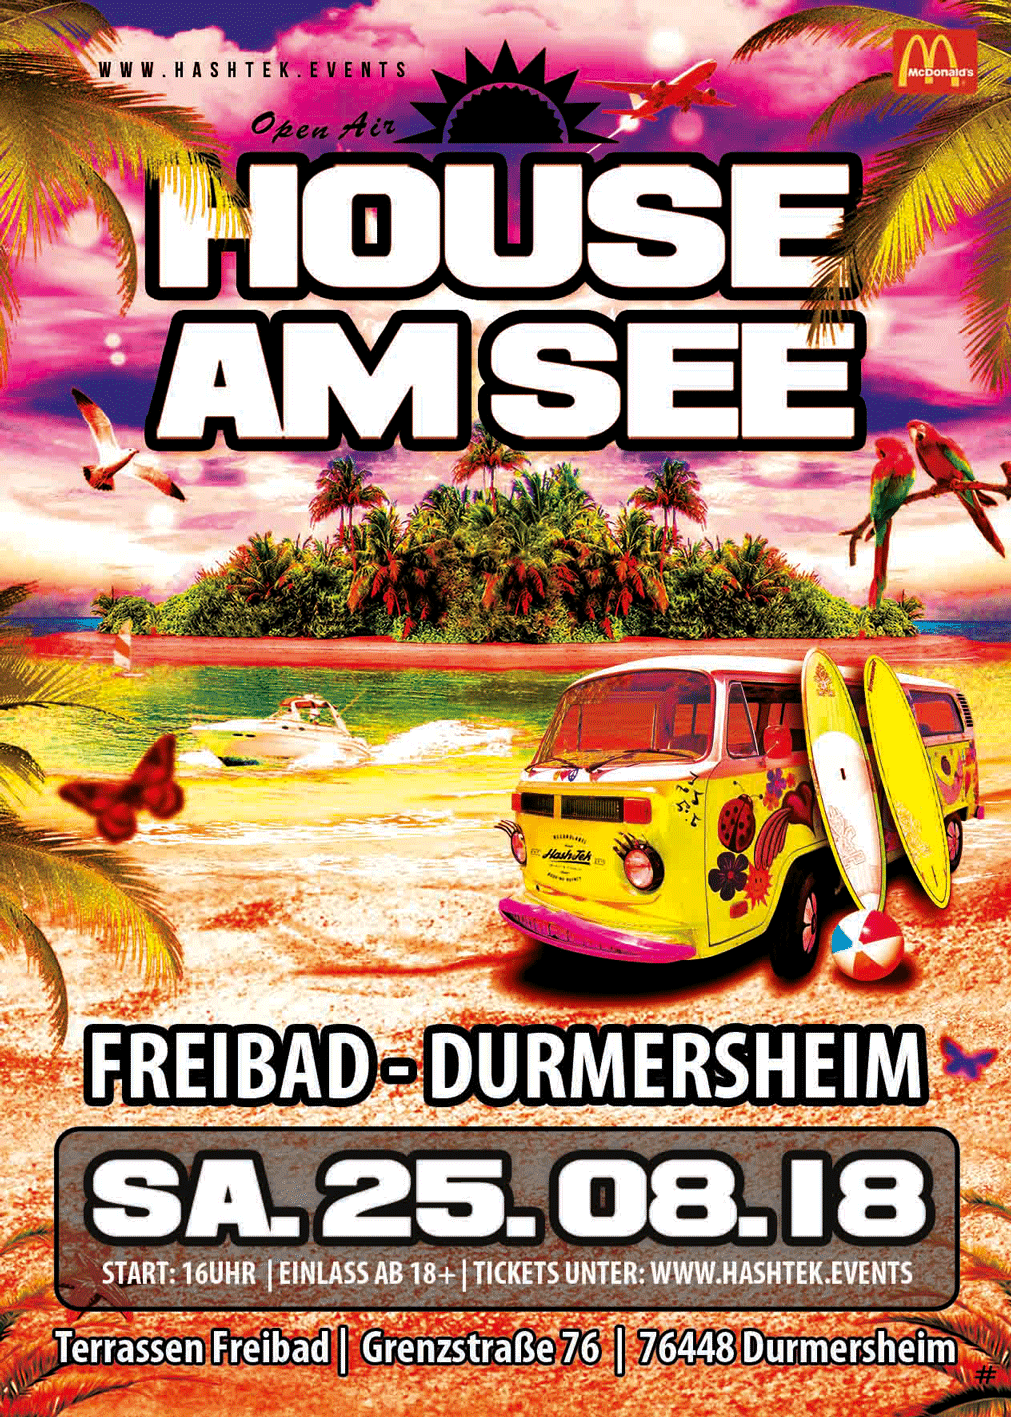 HOUSE AM SEE - Durmersheim - Freibad